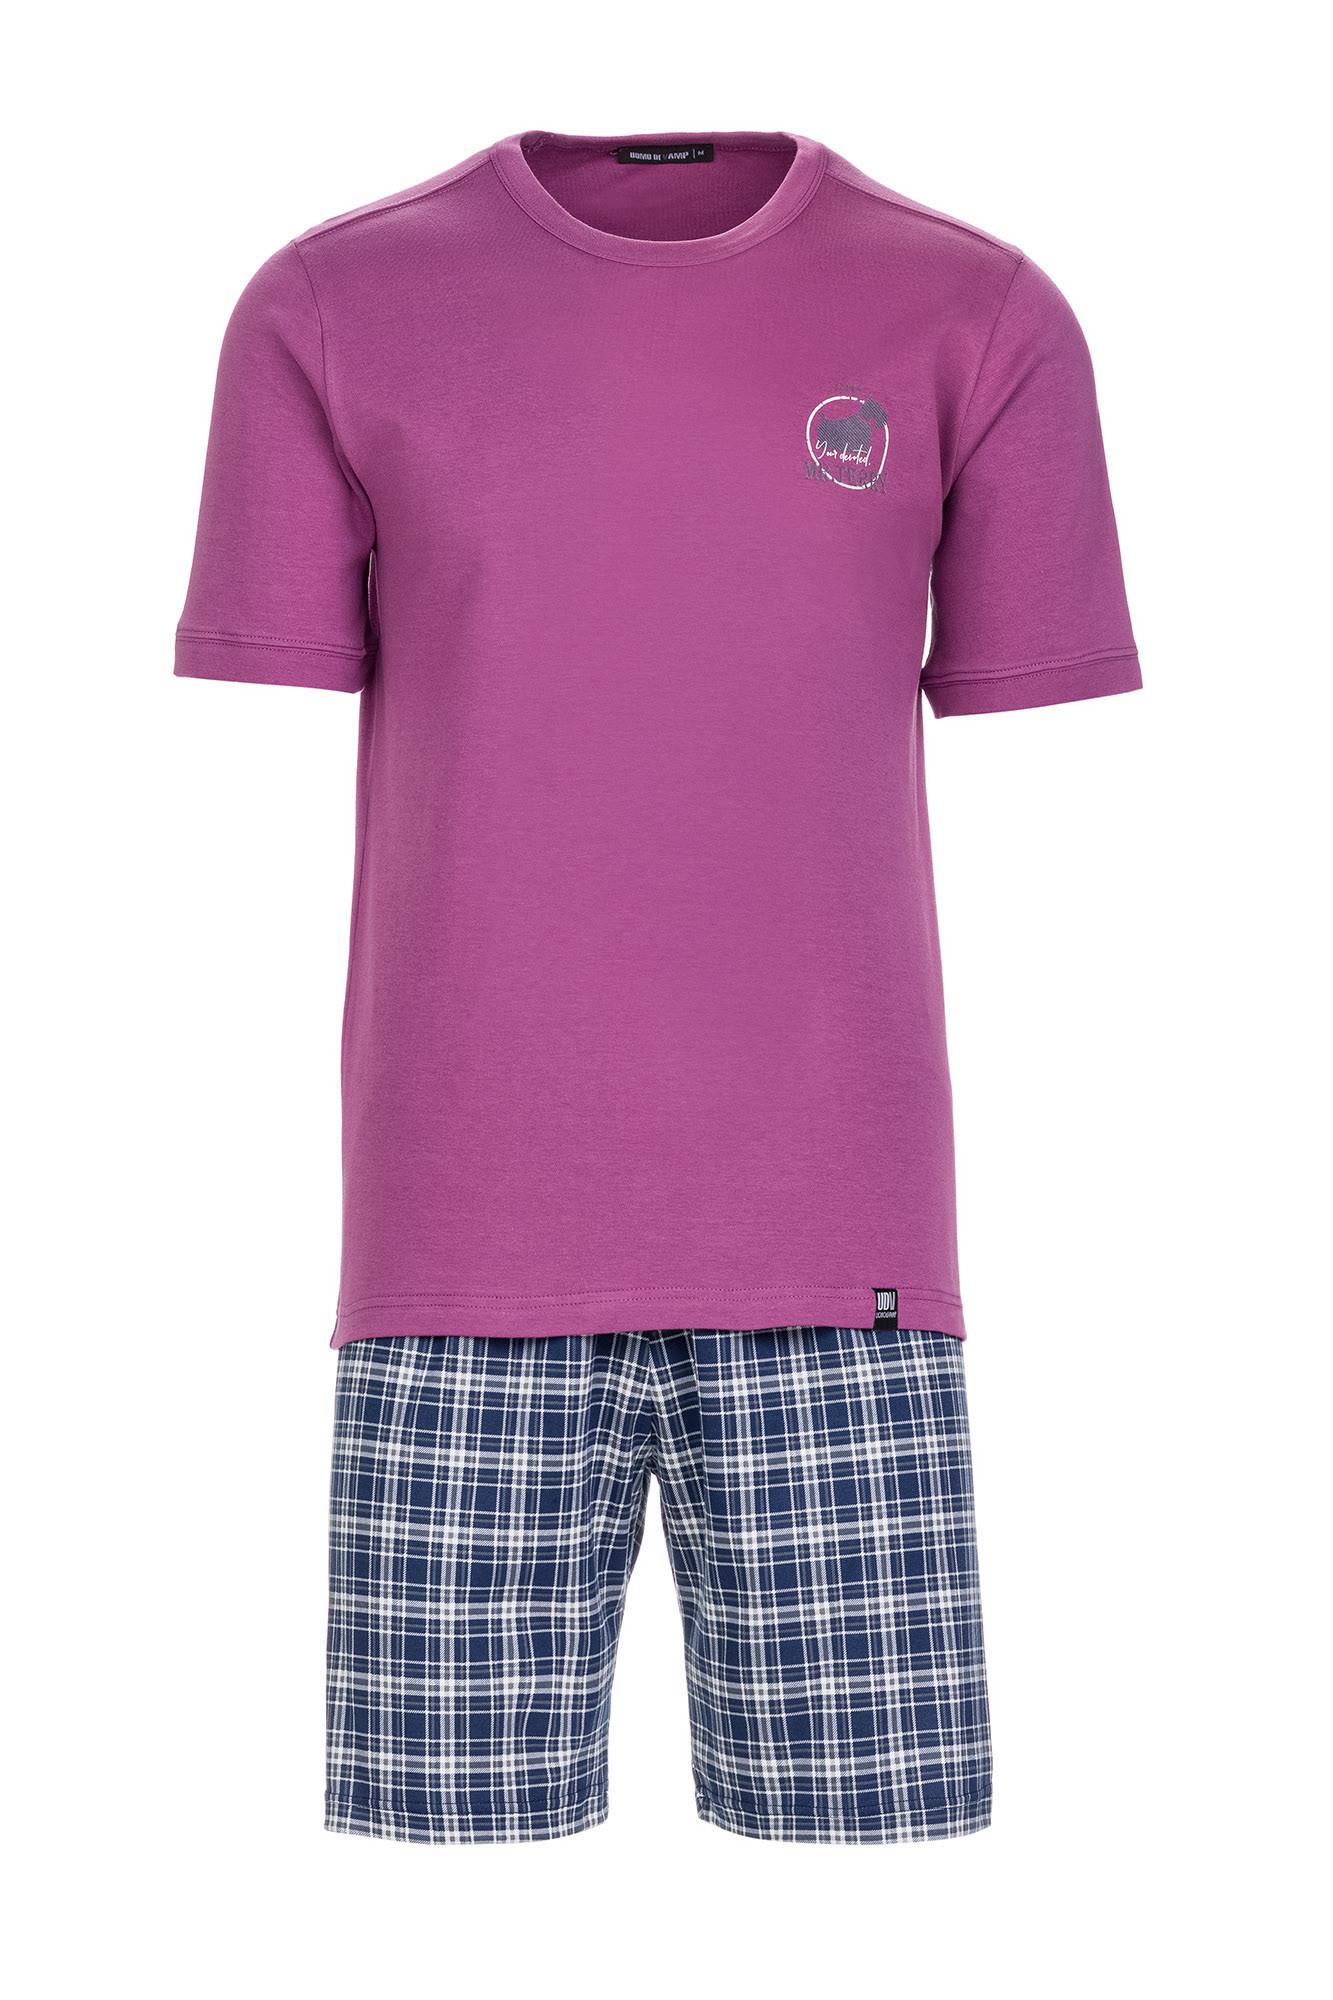 Vamp - Pánske pohodlné pyžamo 13702 - Vamp purple royal xl